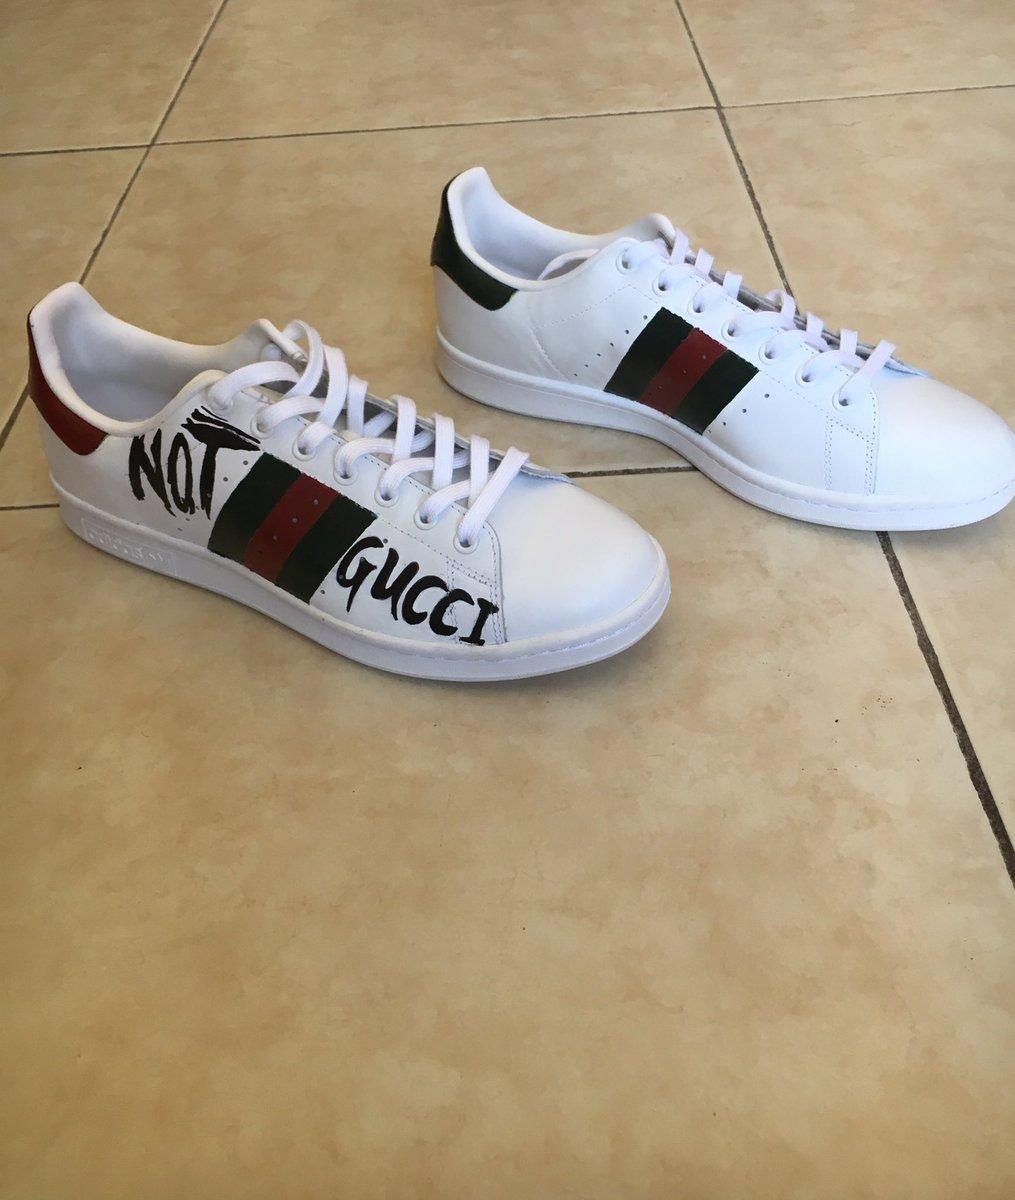 Adidas Stan Smith Not Gucci custom